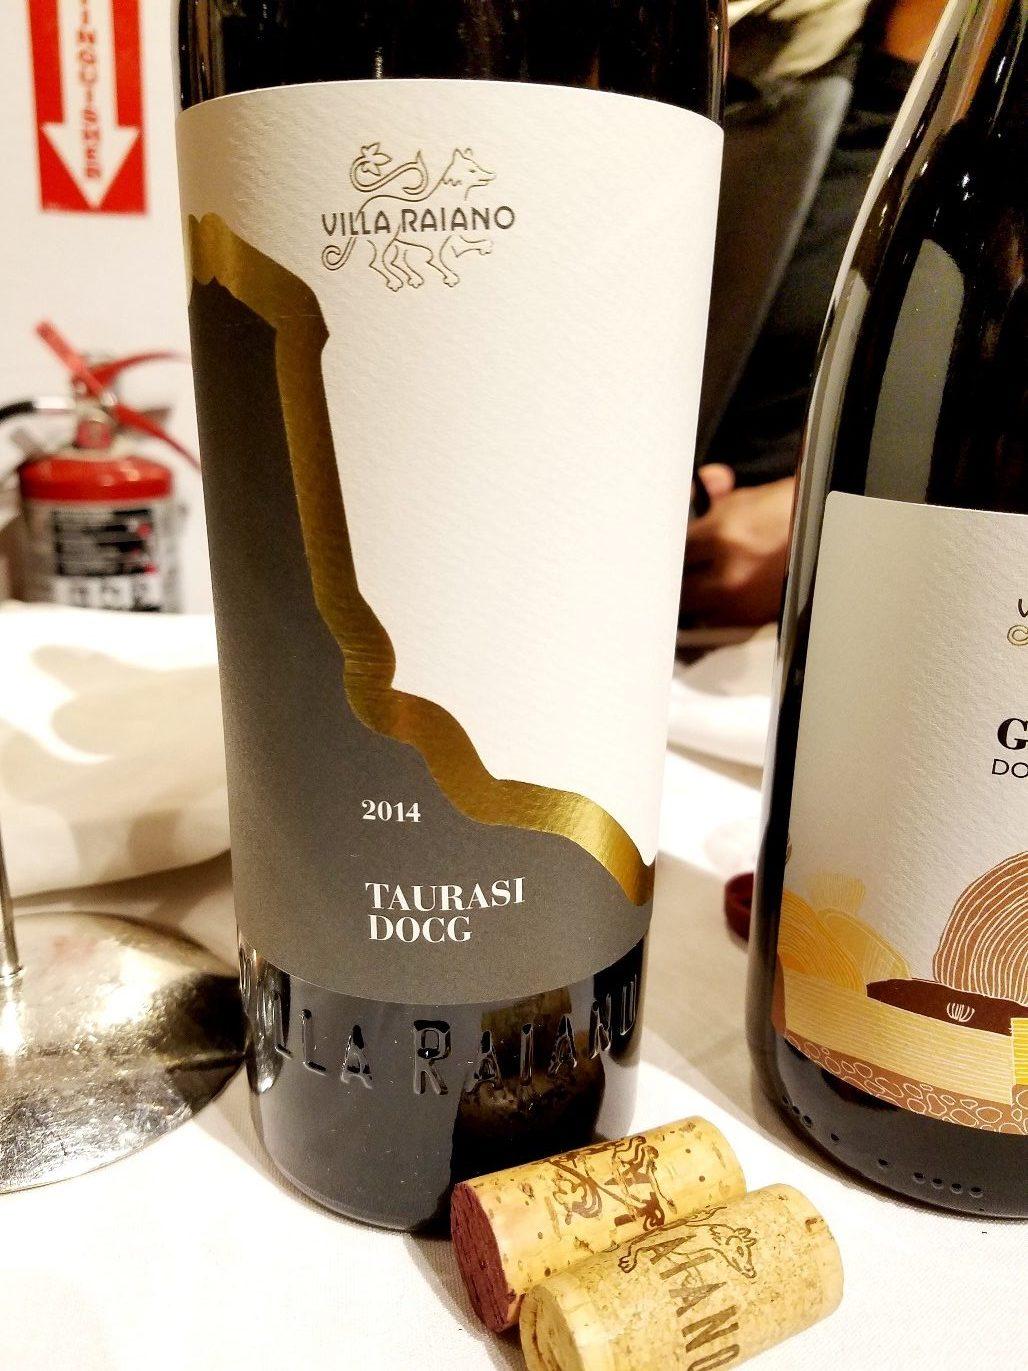 Villa Raiano Taurasi DOCG 2014, James Suckling Great Wines of Italy New York 2020, Wine Casual